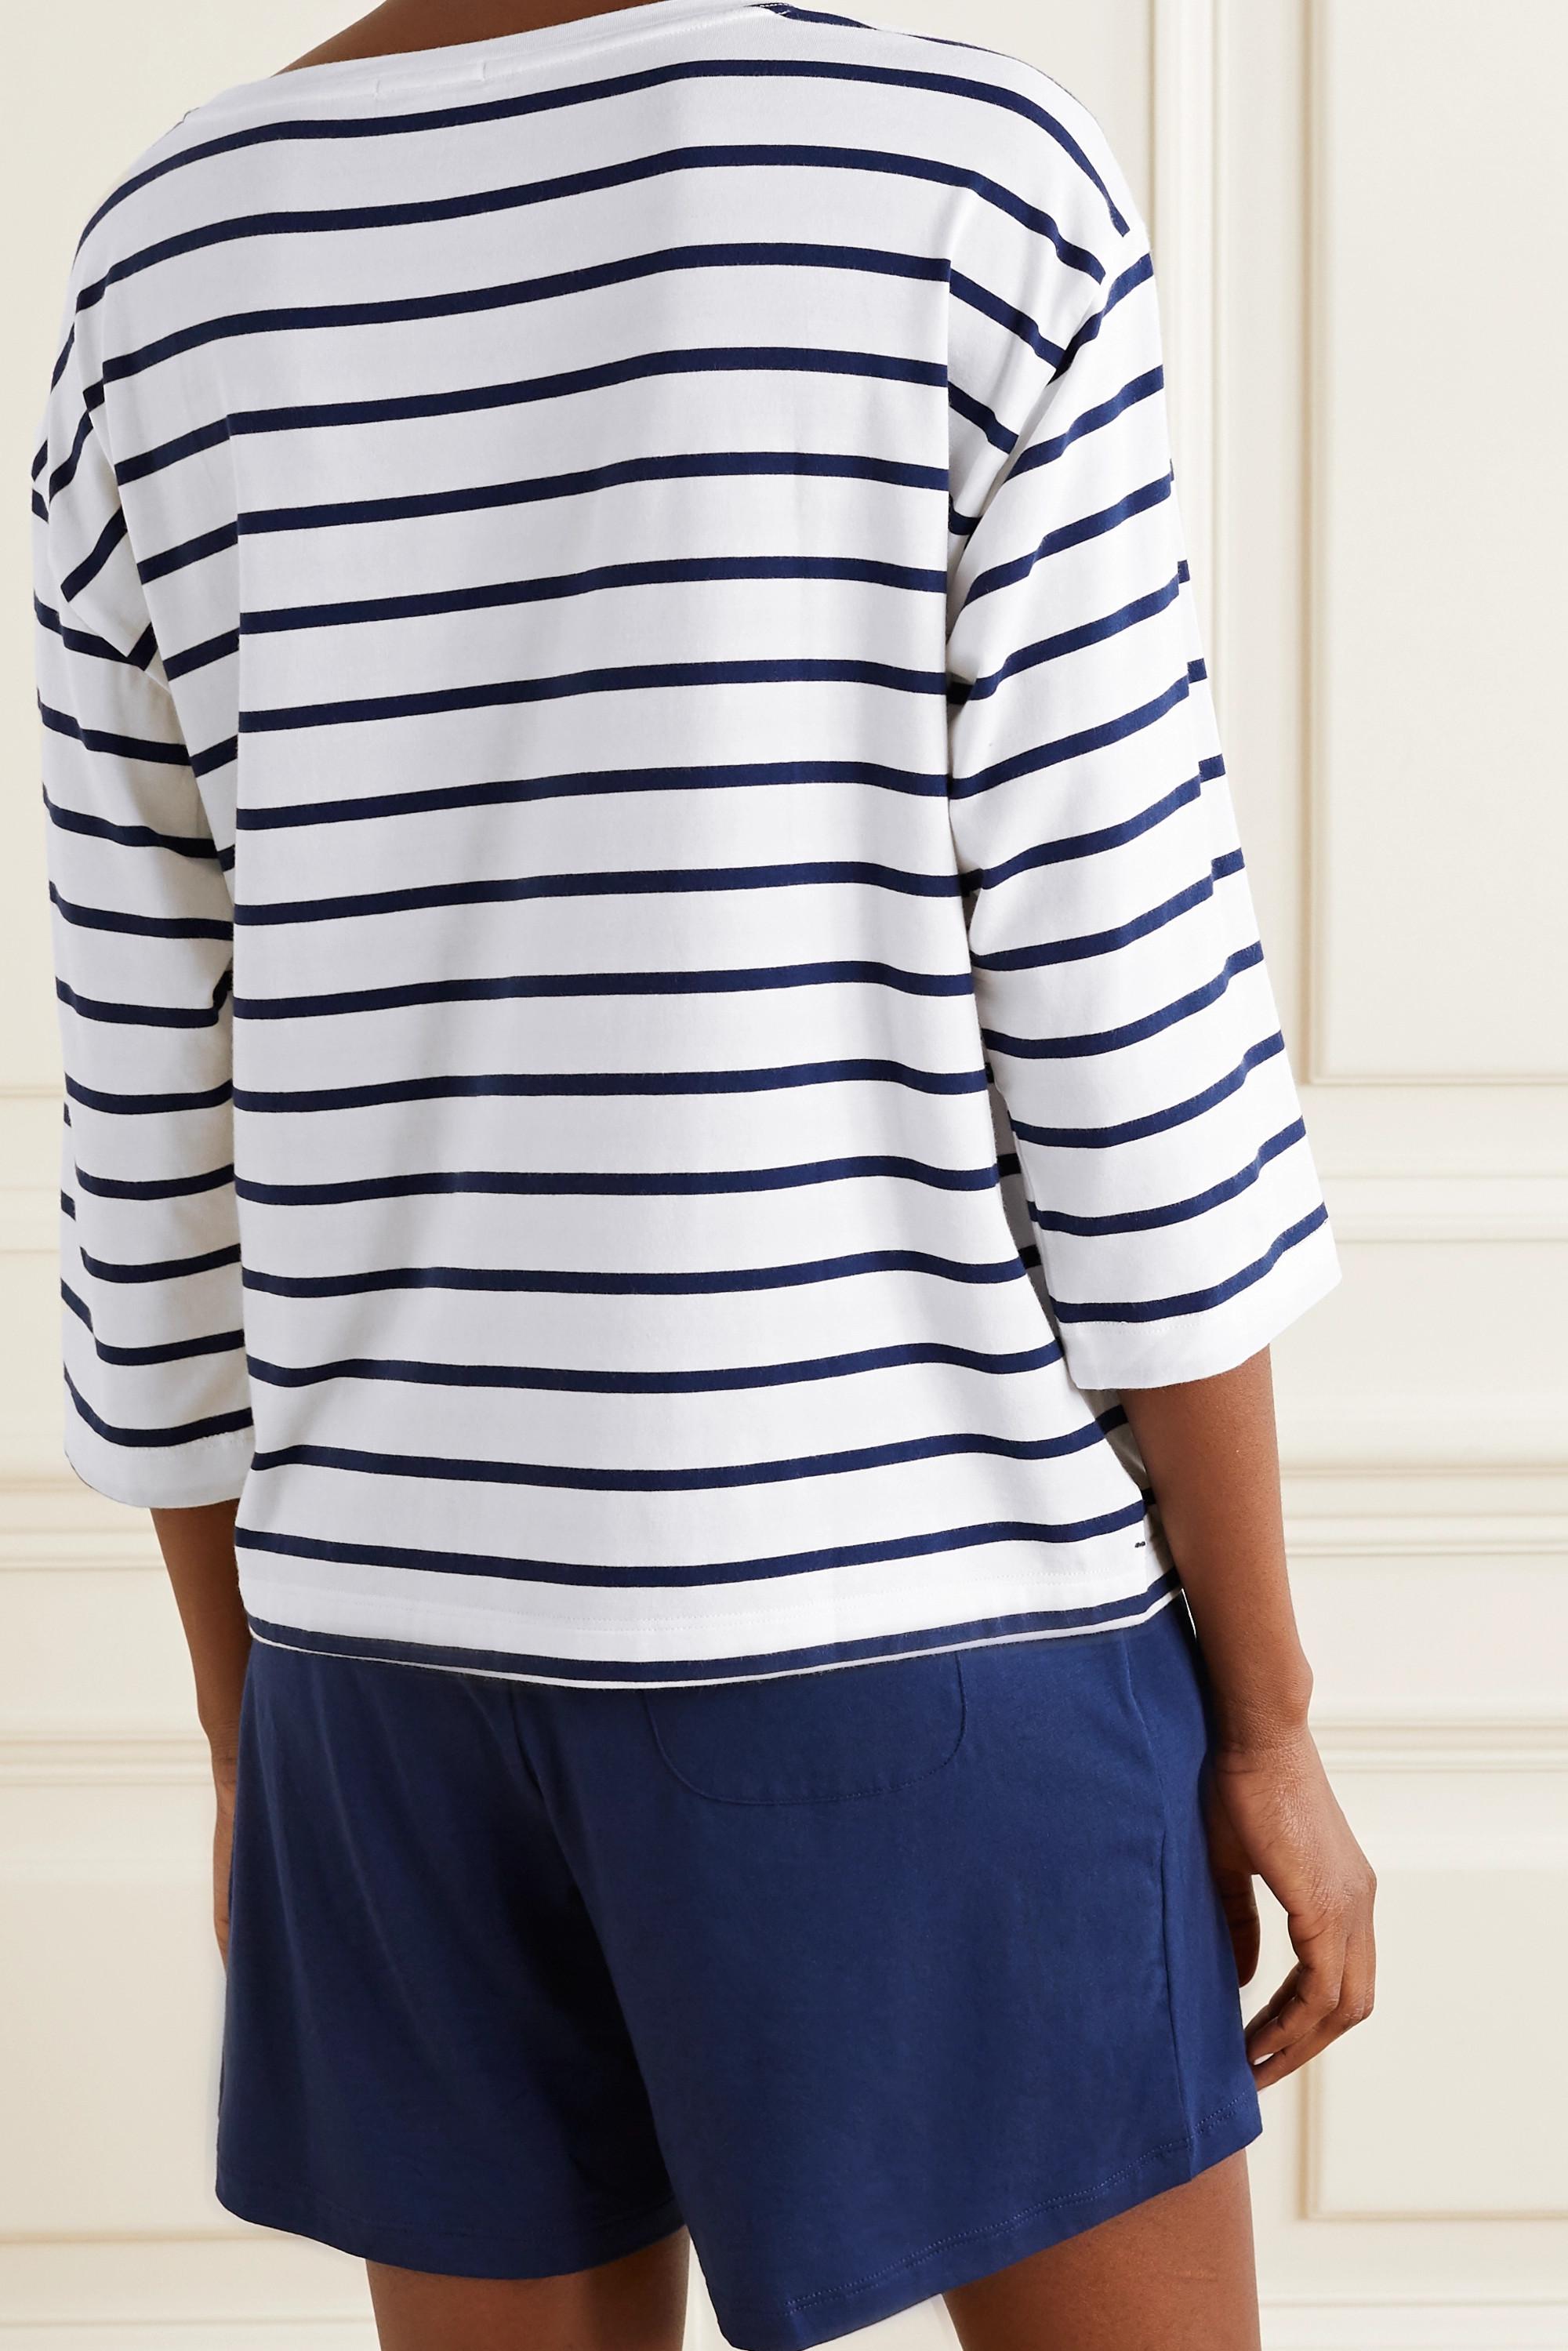 Skin Mathilde striped stretch-jersey top